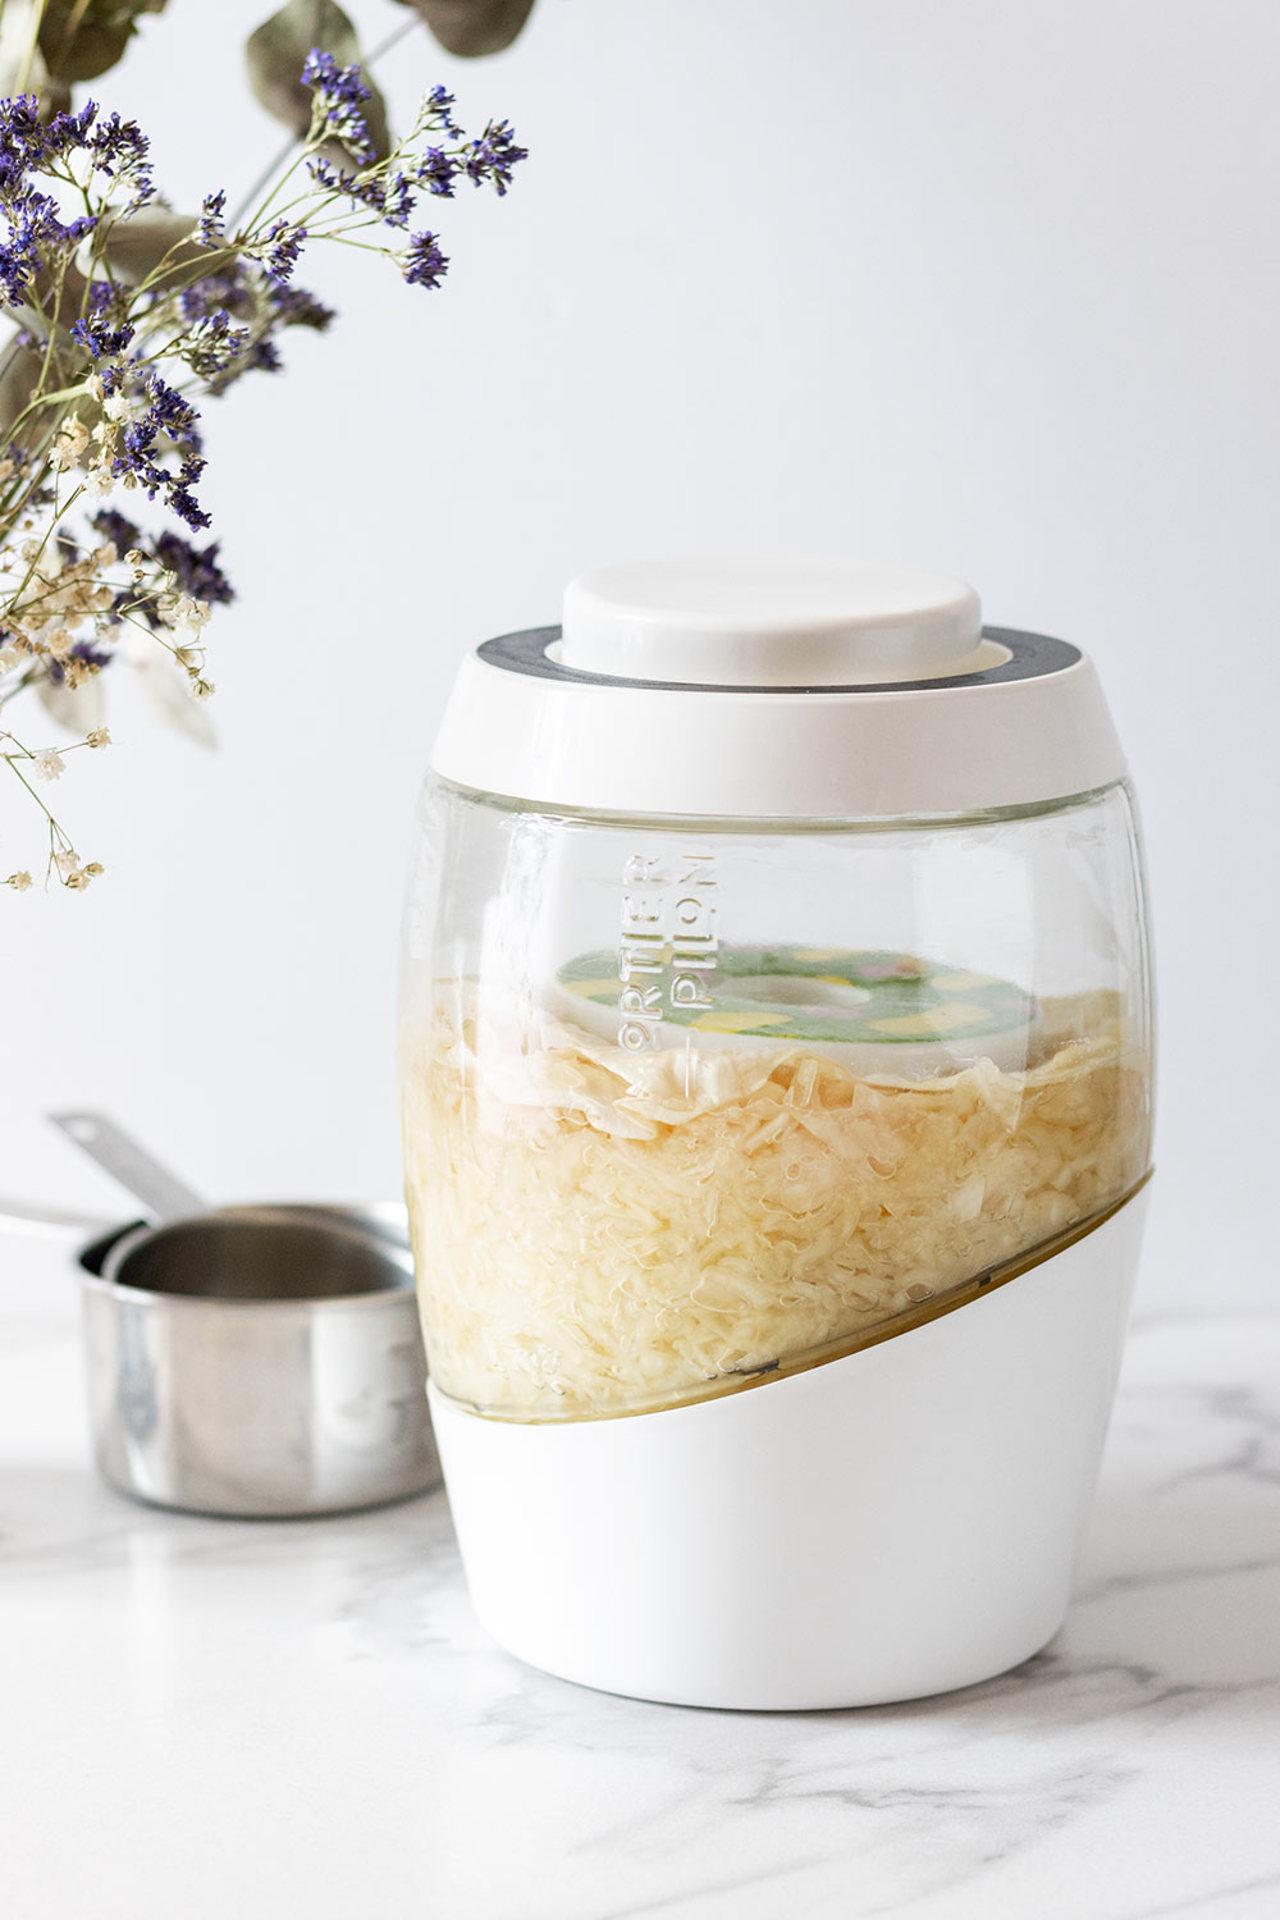 Beneficios del chucrut o col fermentada